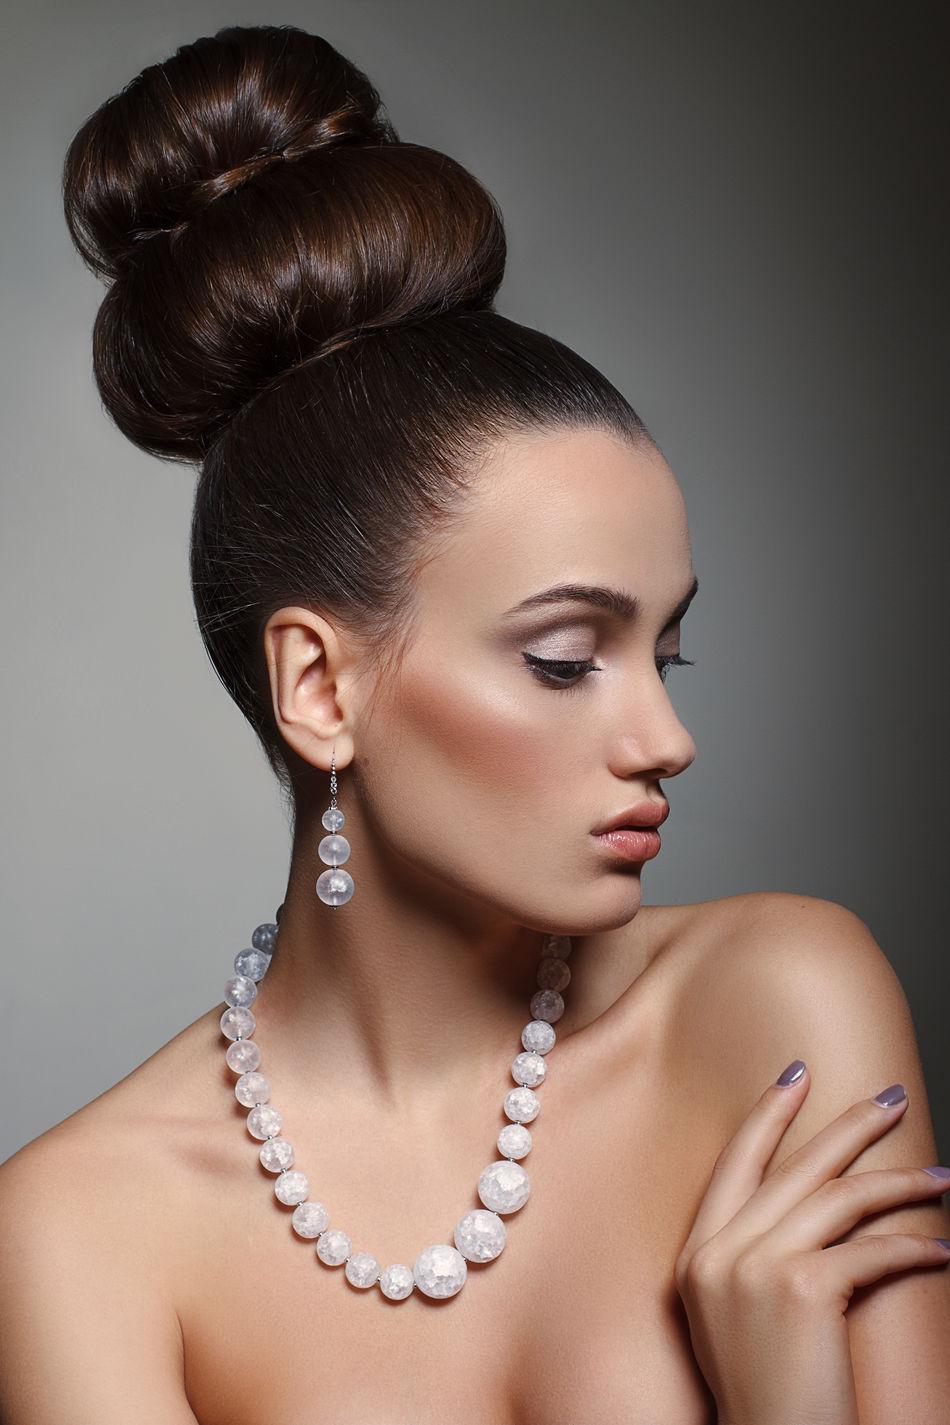 Beautiful stock photos of lippen, 20-24 Years, Beautiful Woman, Brown Hair, Close-Up